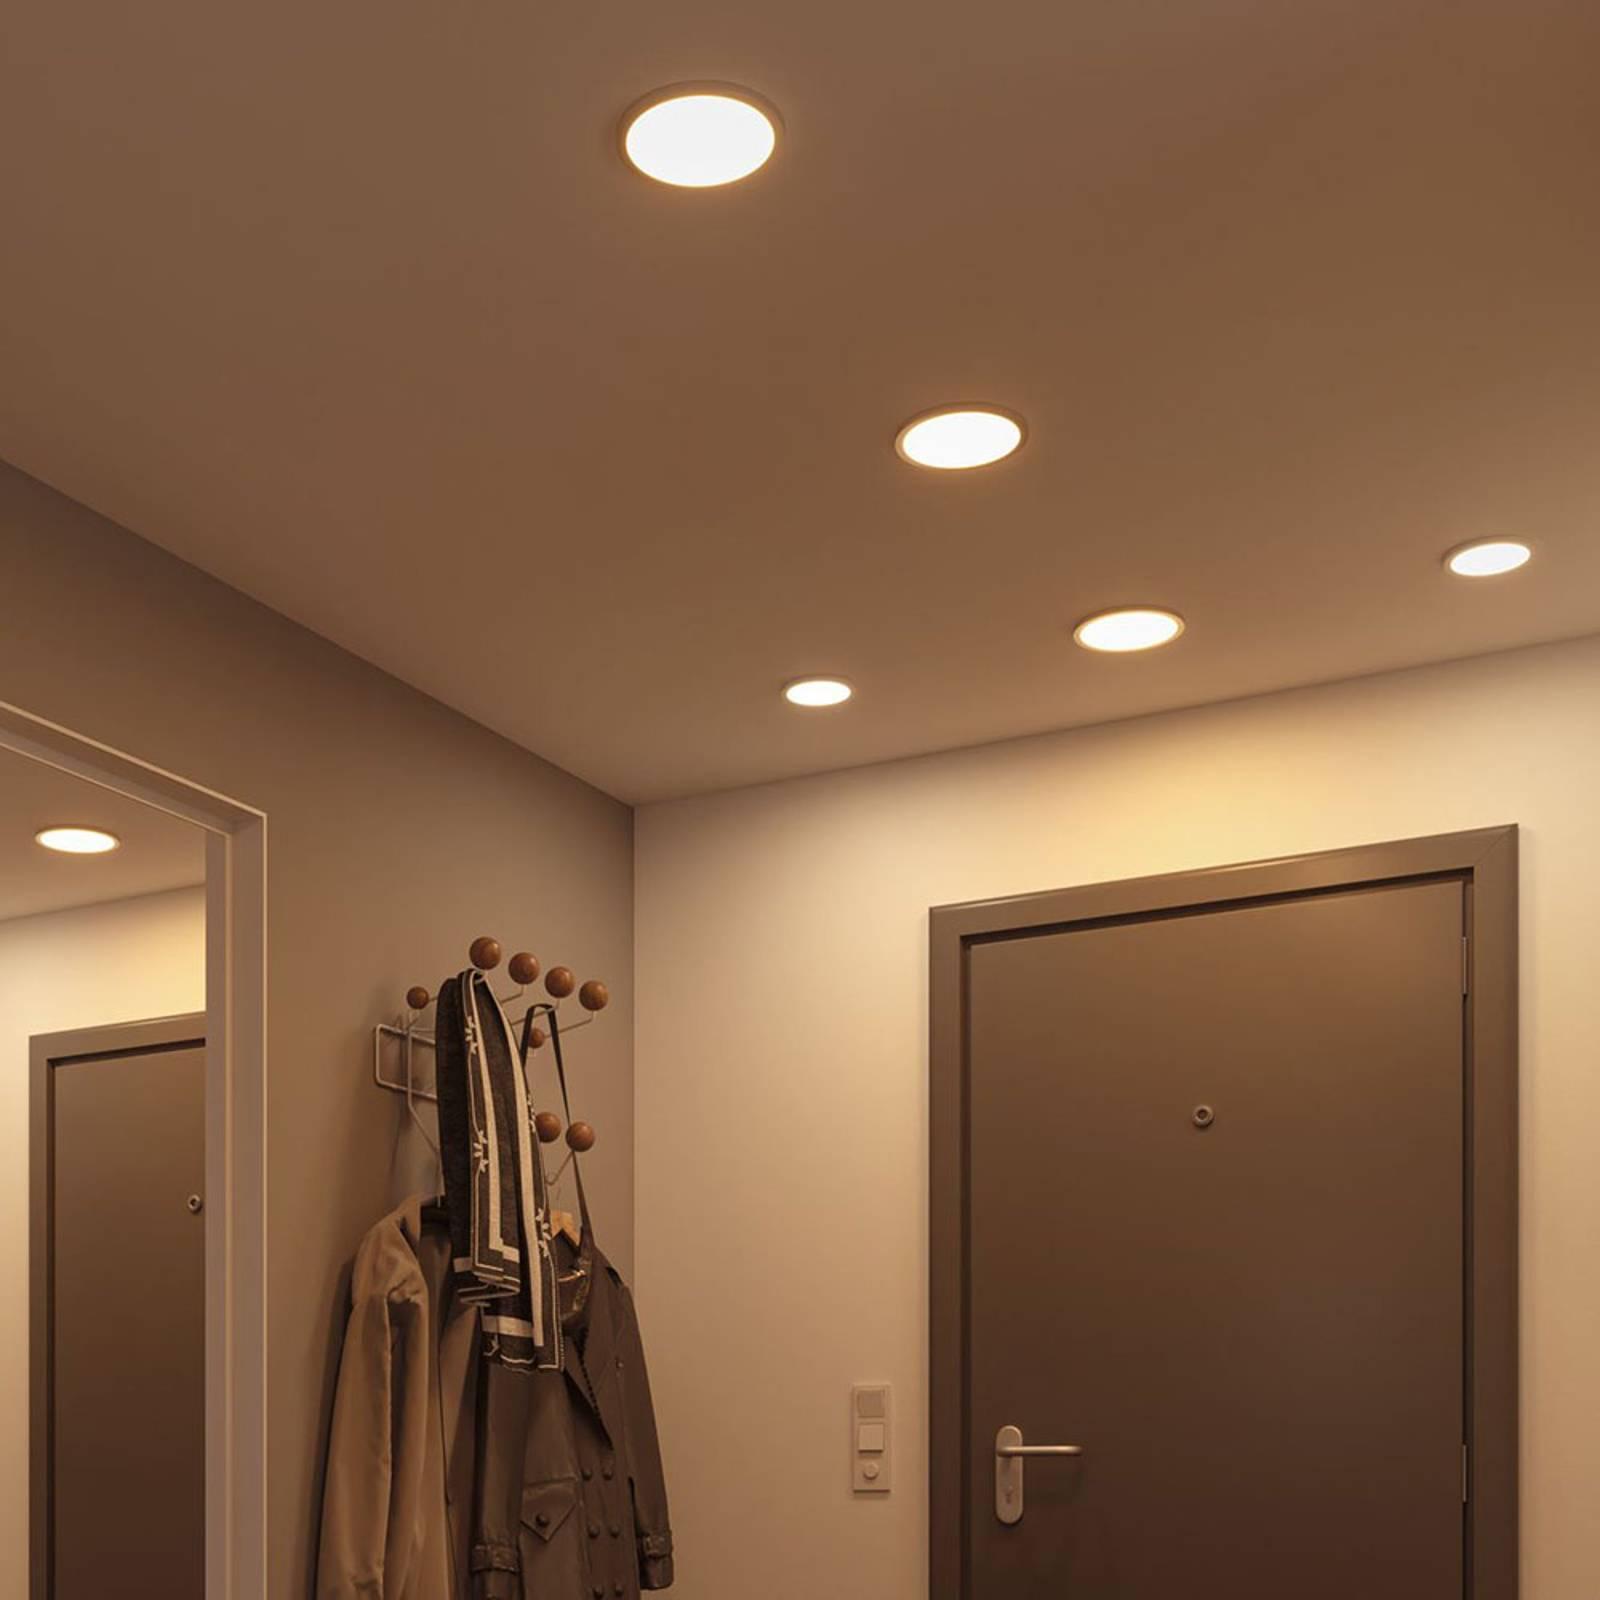 Paulmann-LED-paneeli Areo 4000 K, kromi, 17,5cm